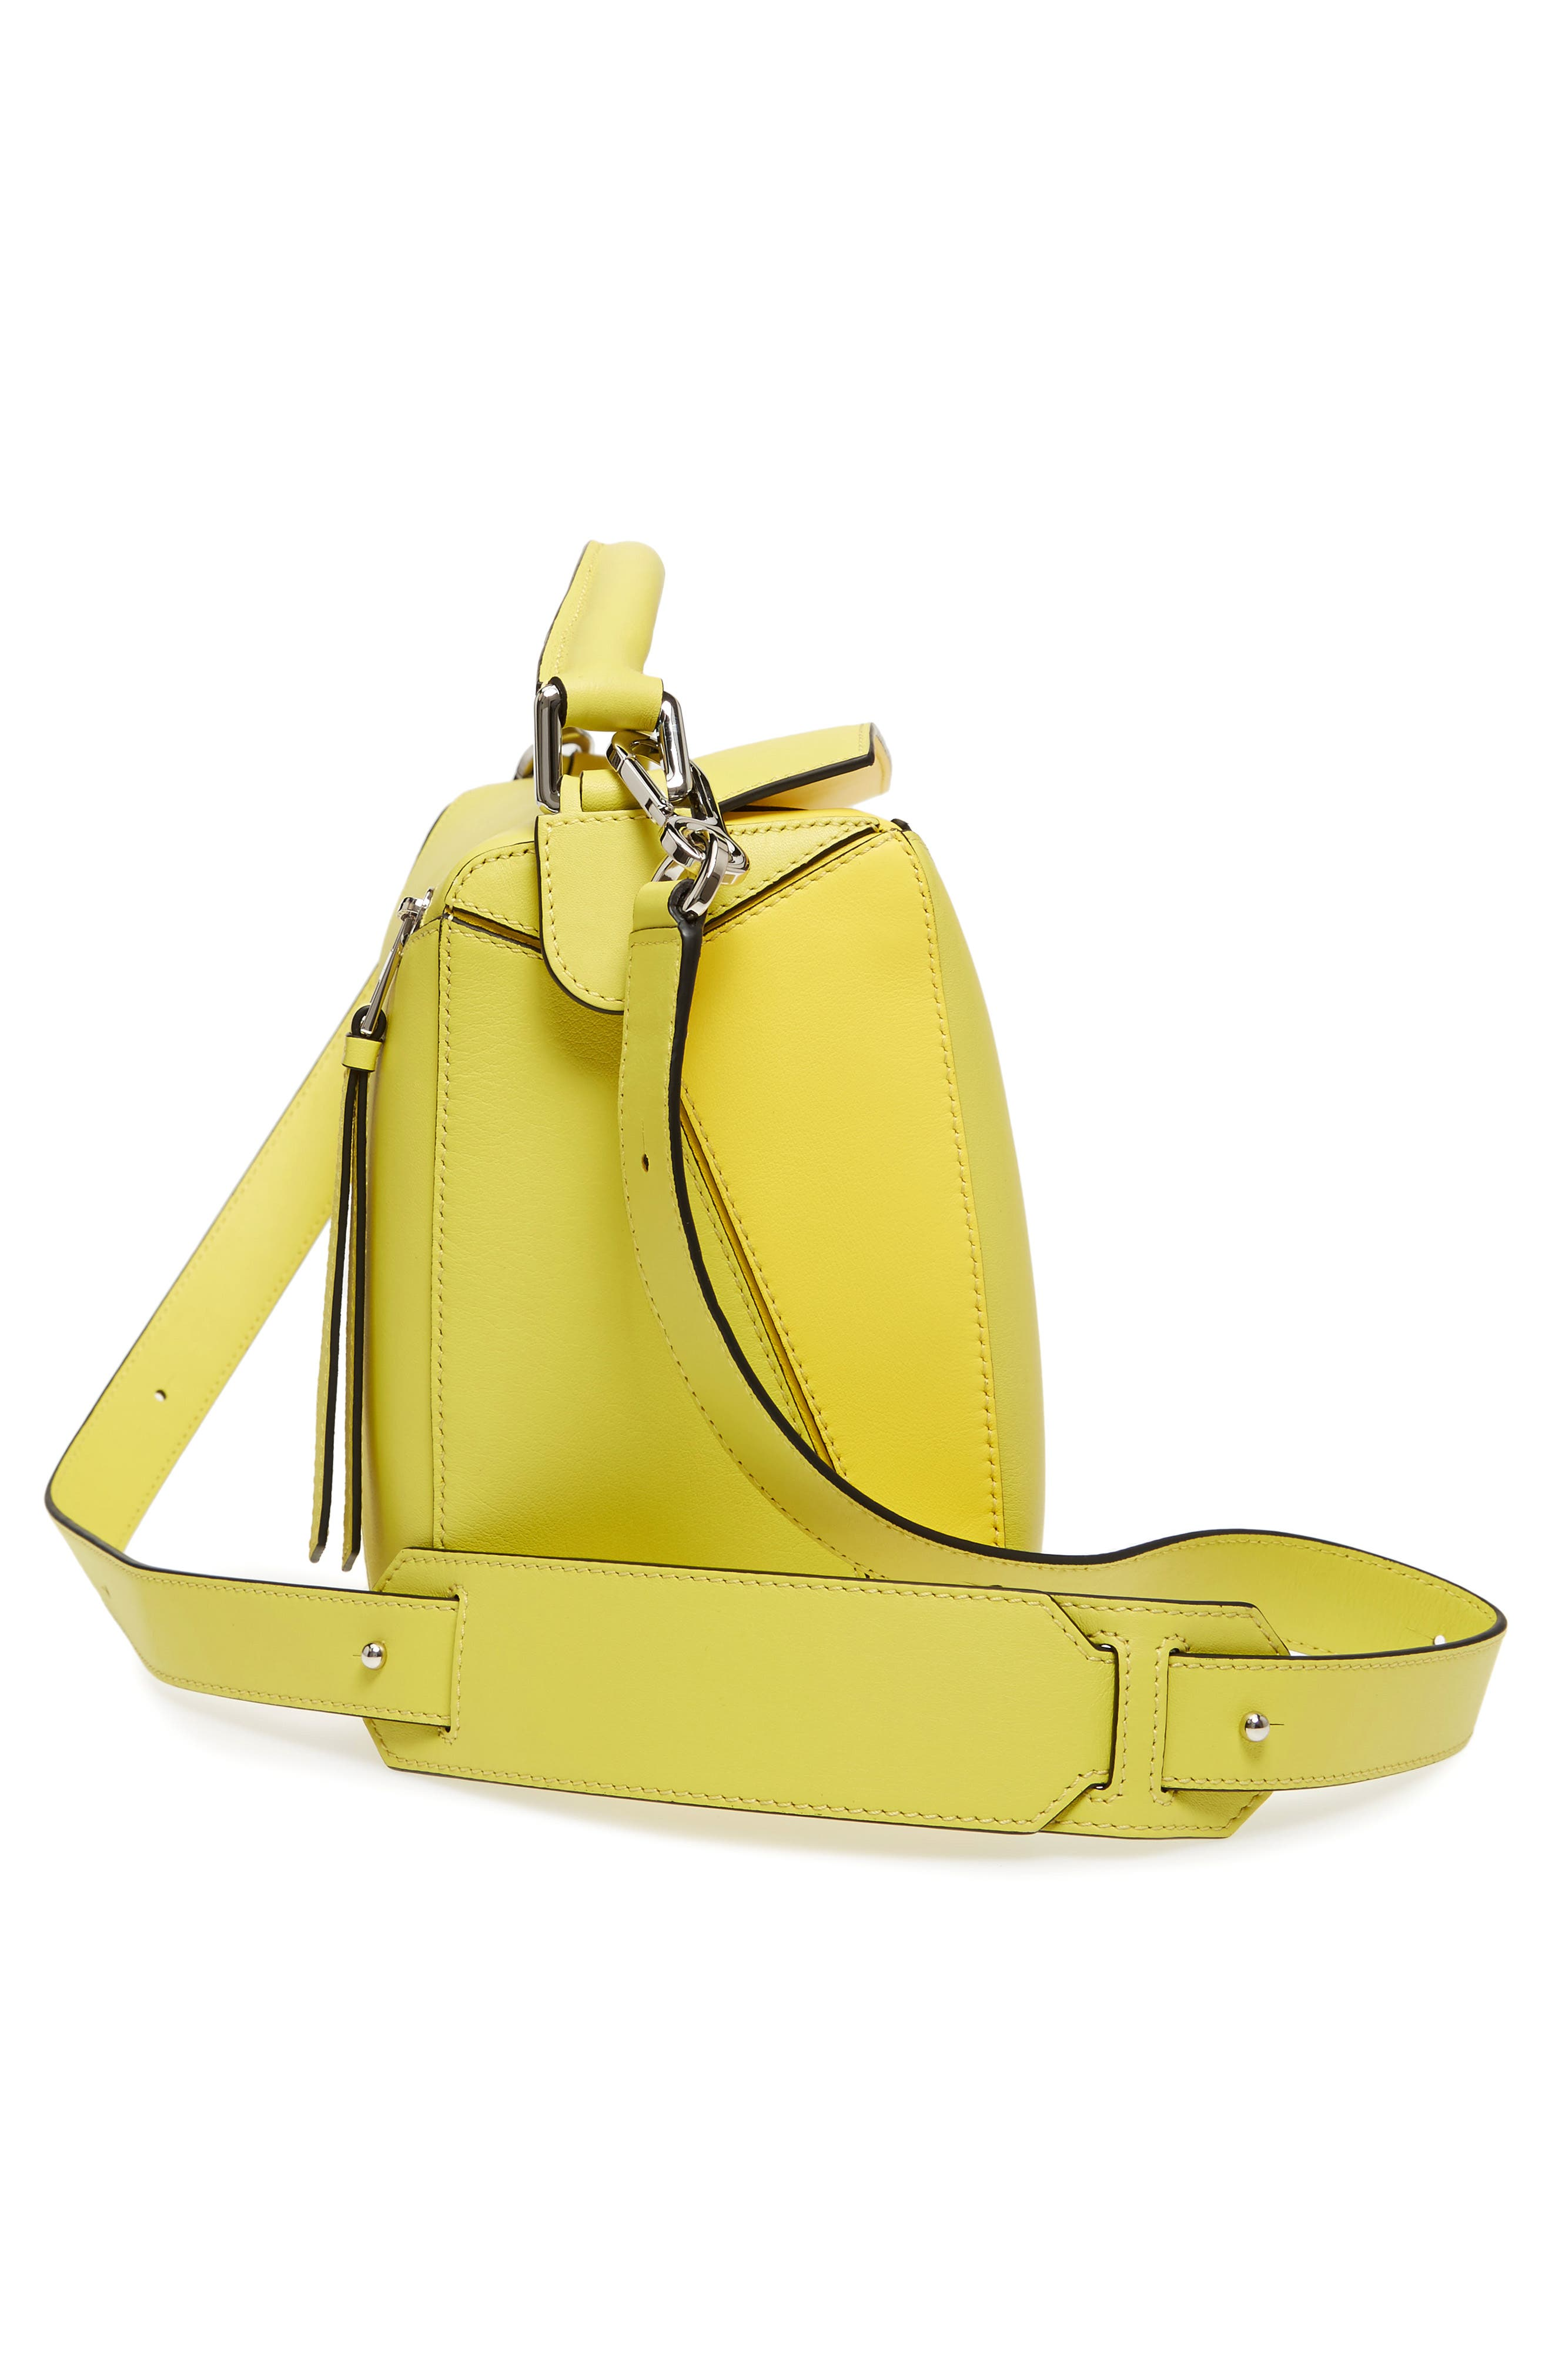 Medium Puzzle Calfskin Leather Shoulder Bag,                             Alternate thumbnail 6, color,                             Yellow Multitone